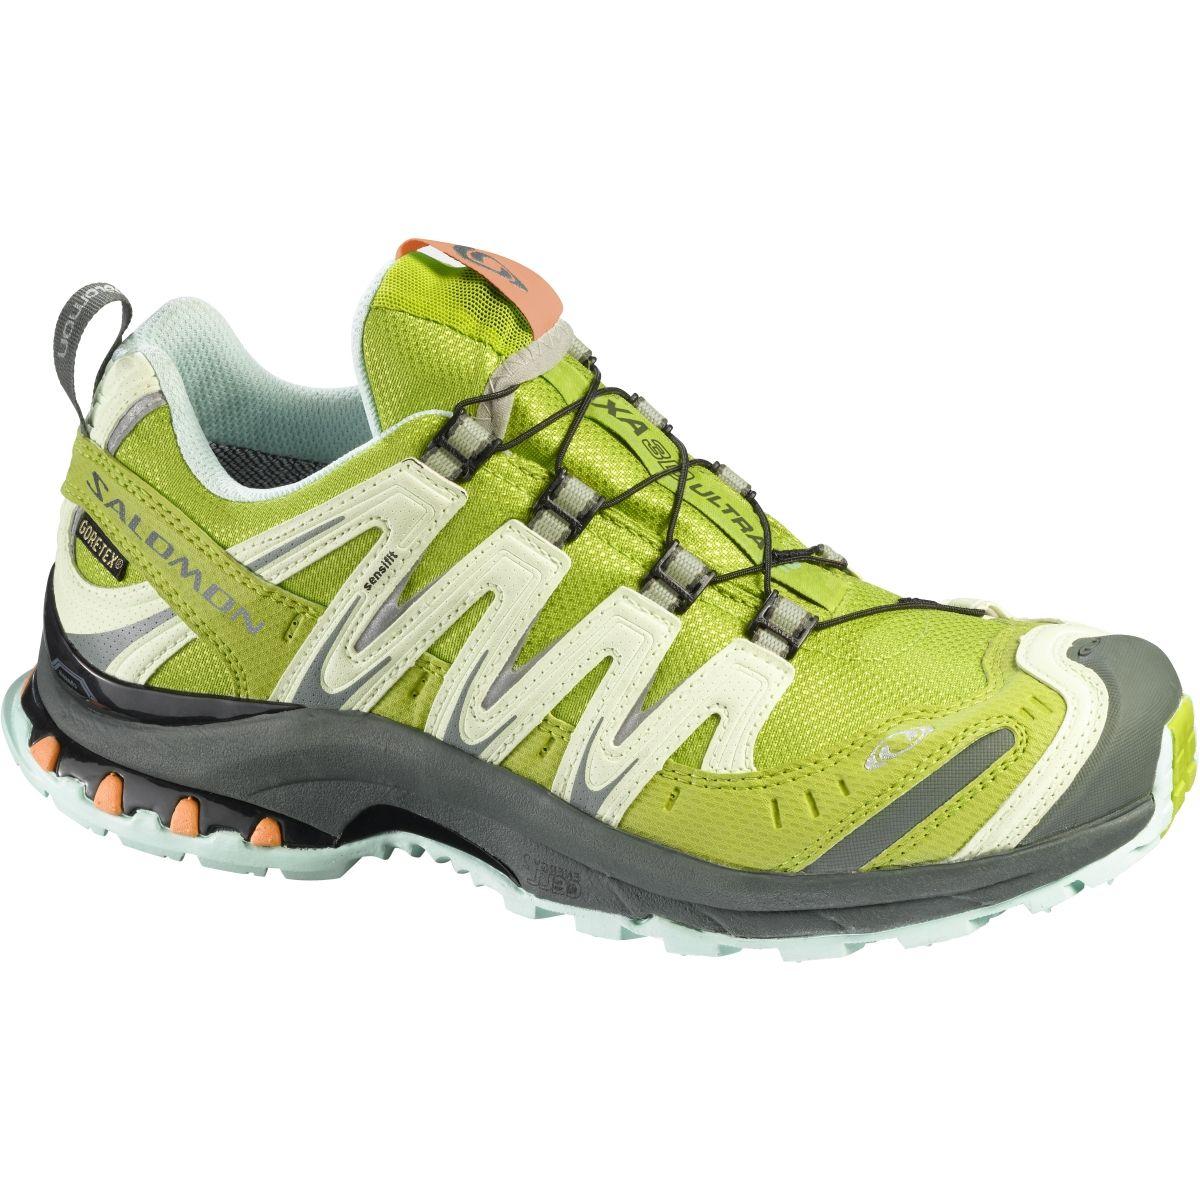 Salomon XA Pro 3D Ultra 2 GTX® Trail Running Womens